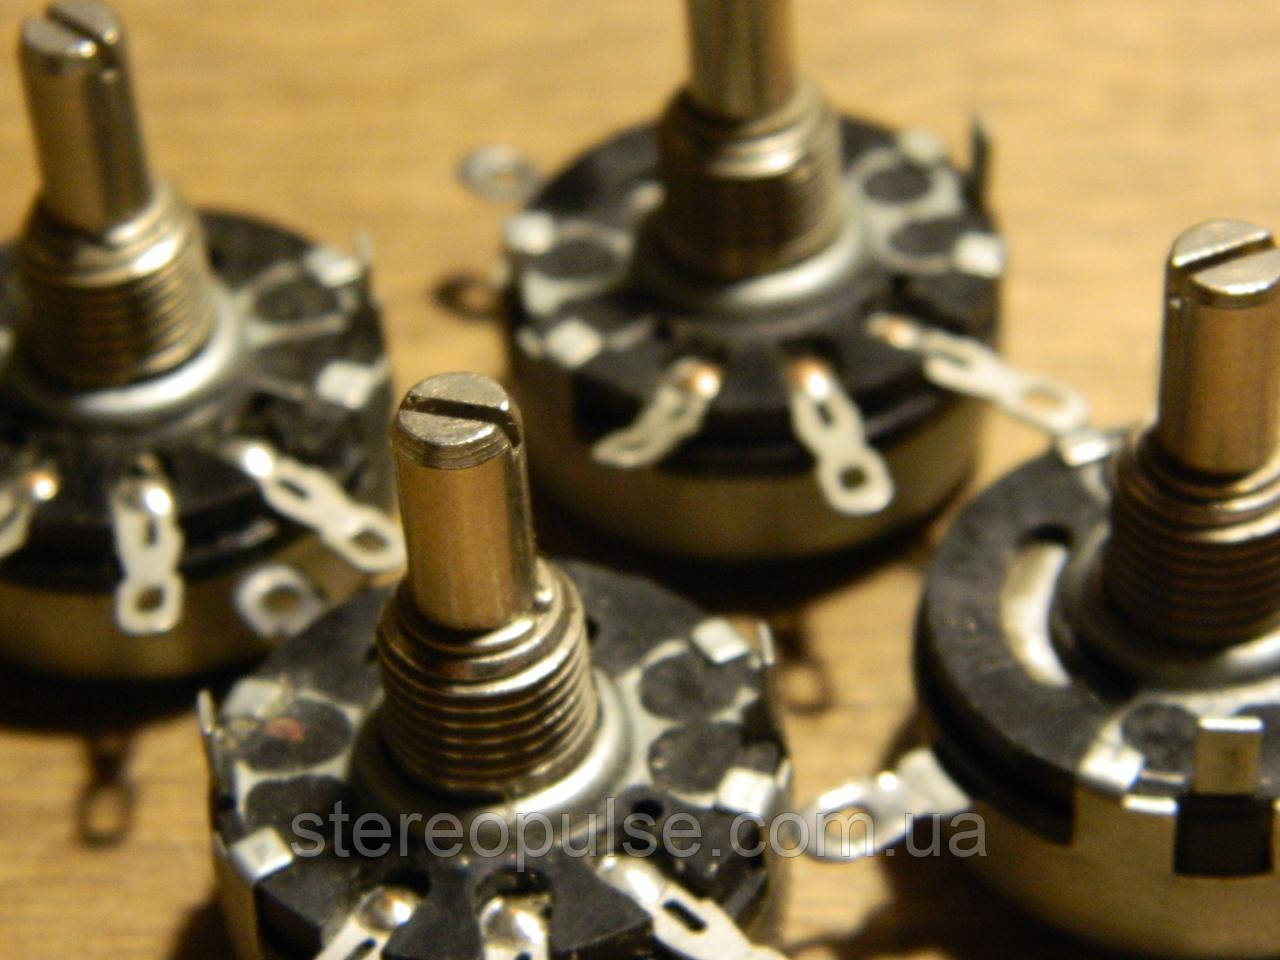 Резистор СП -1 -А 1 вт 150 кОм